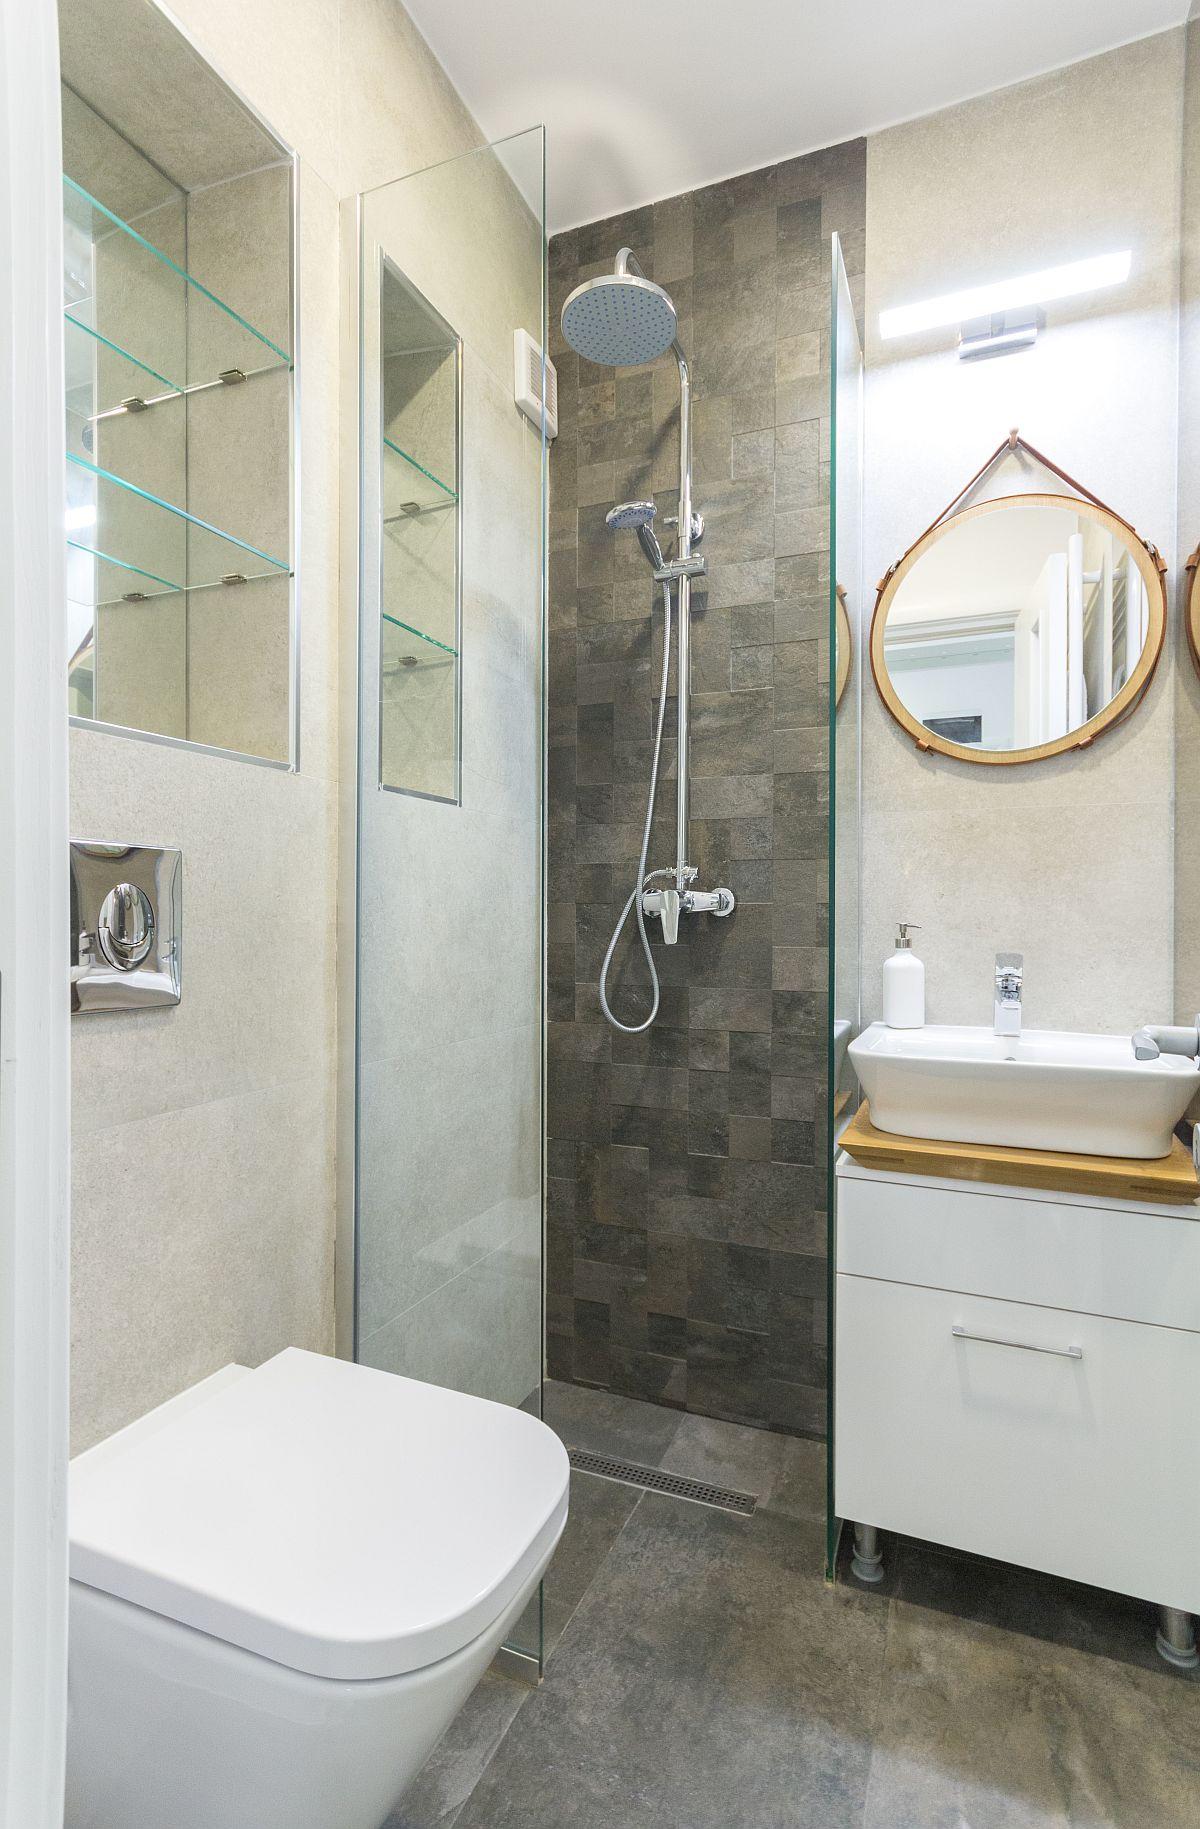 adelaparvu.com despre amenajare apartament 3 camere Bucuresti, designer Cristina Micu (23)